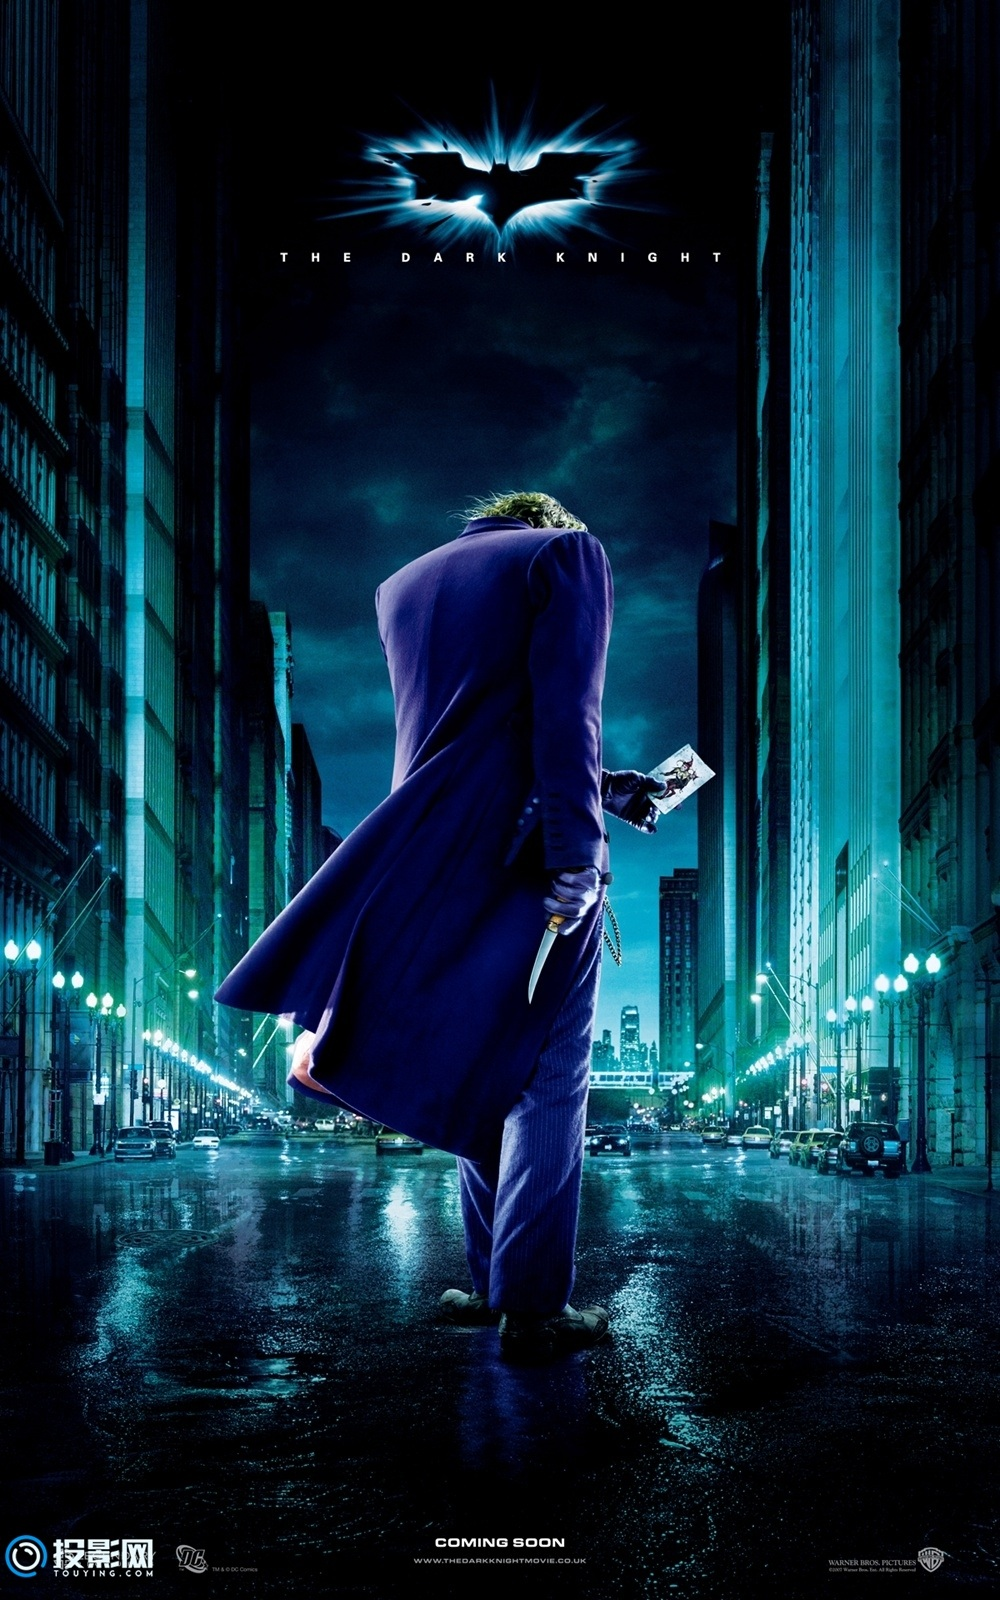 [4K原盘][蝙蝠侠前传3:黑暗骑士崛起][4K+蓝光原盘]81.8GB/60GB